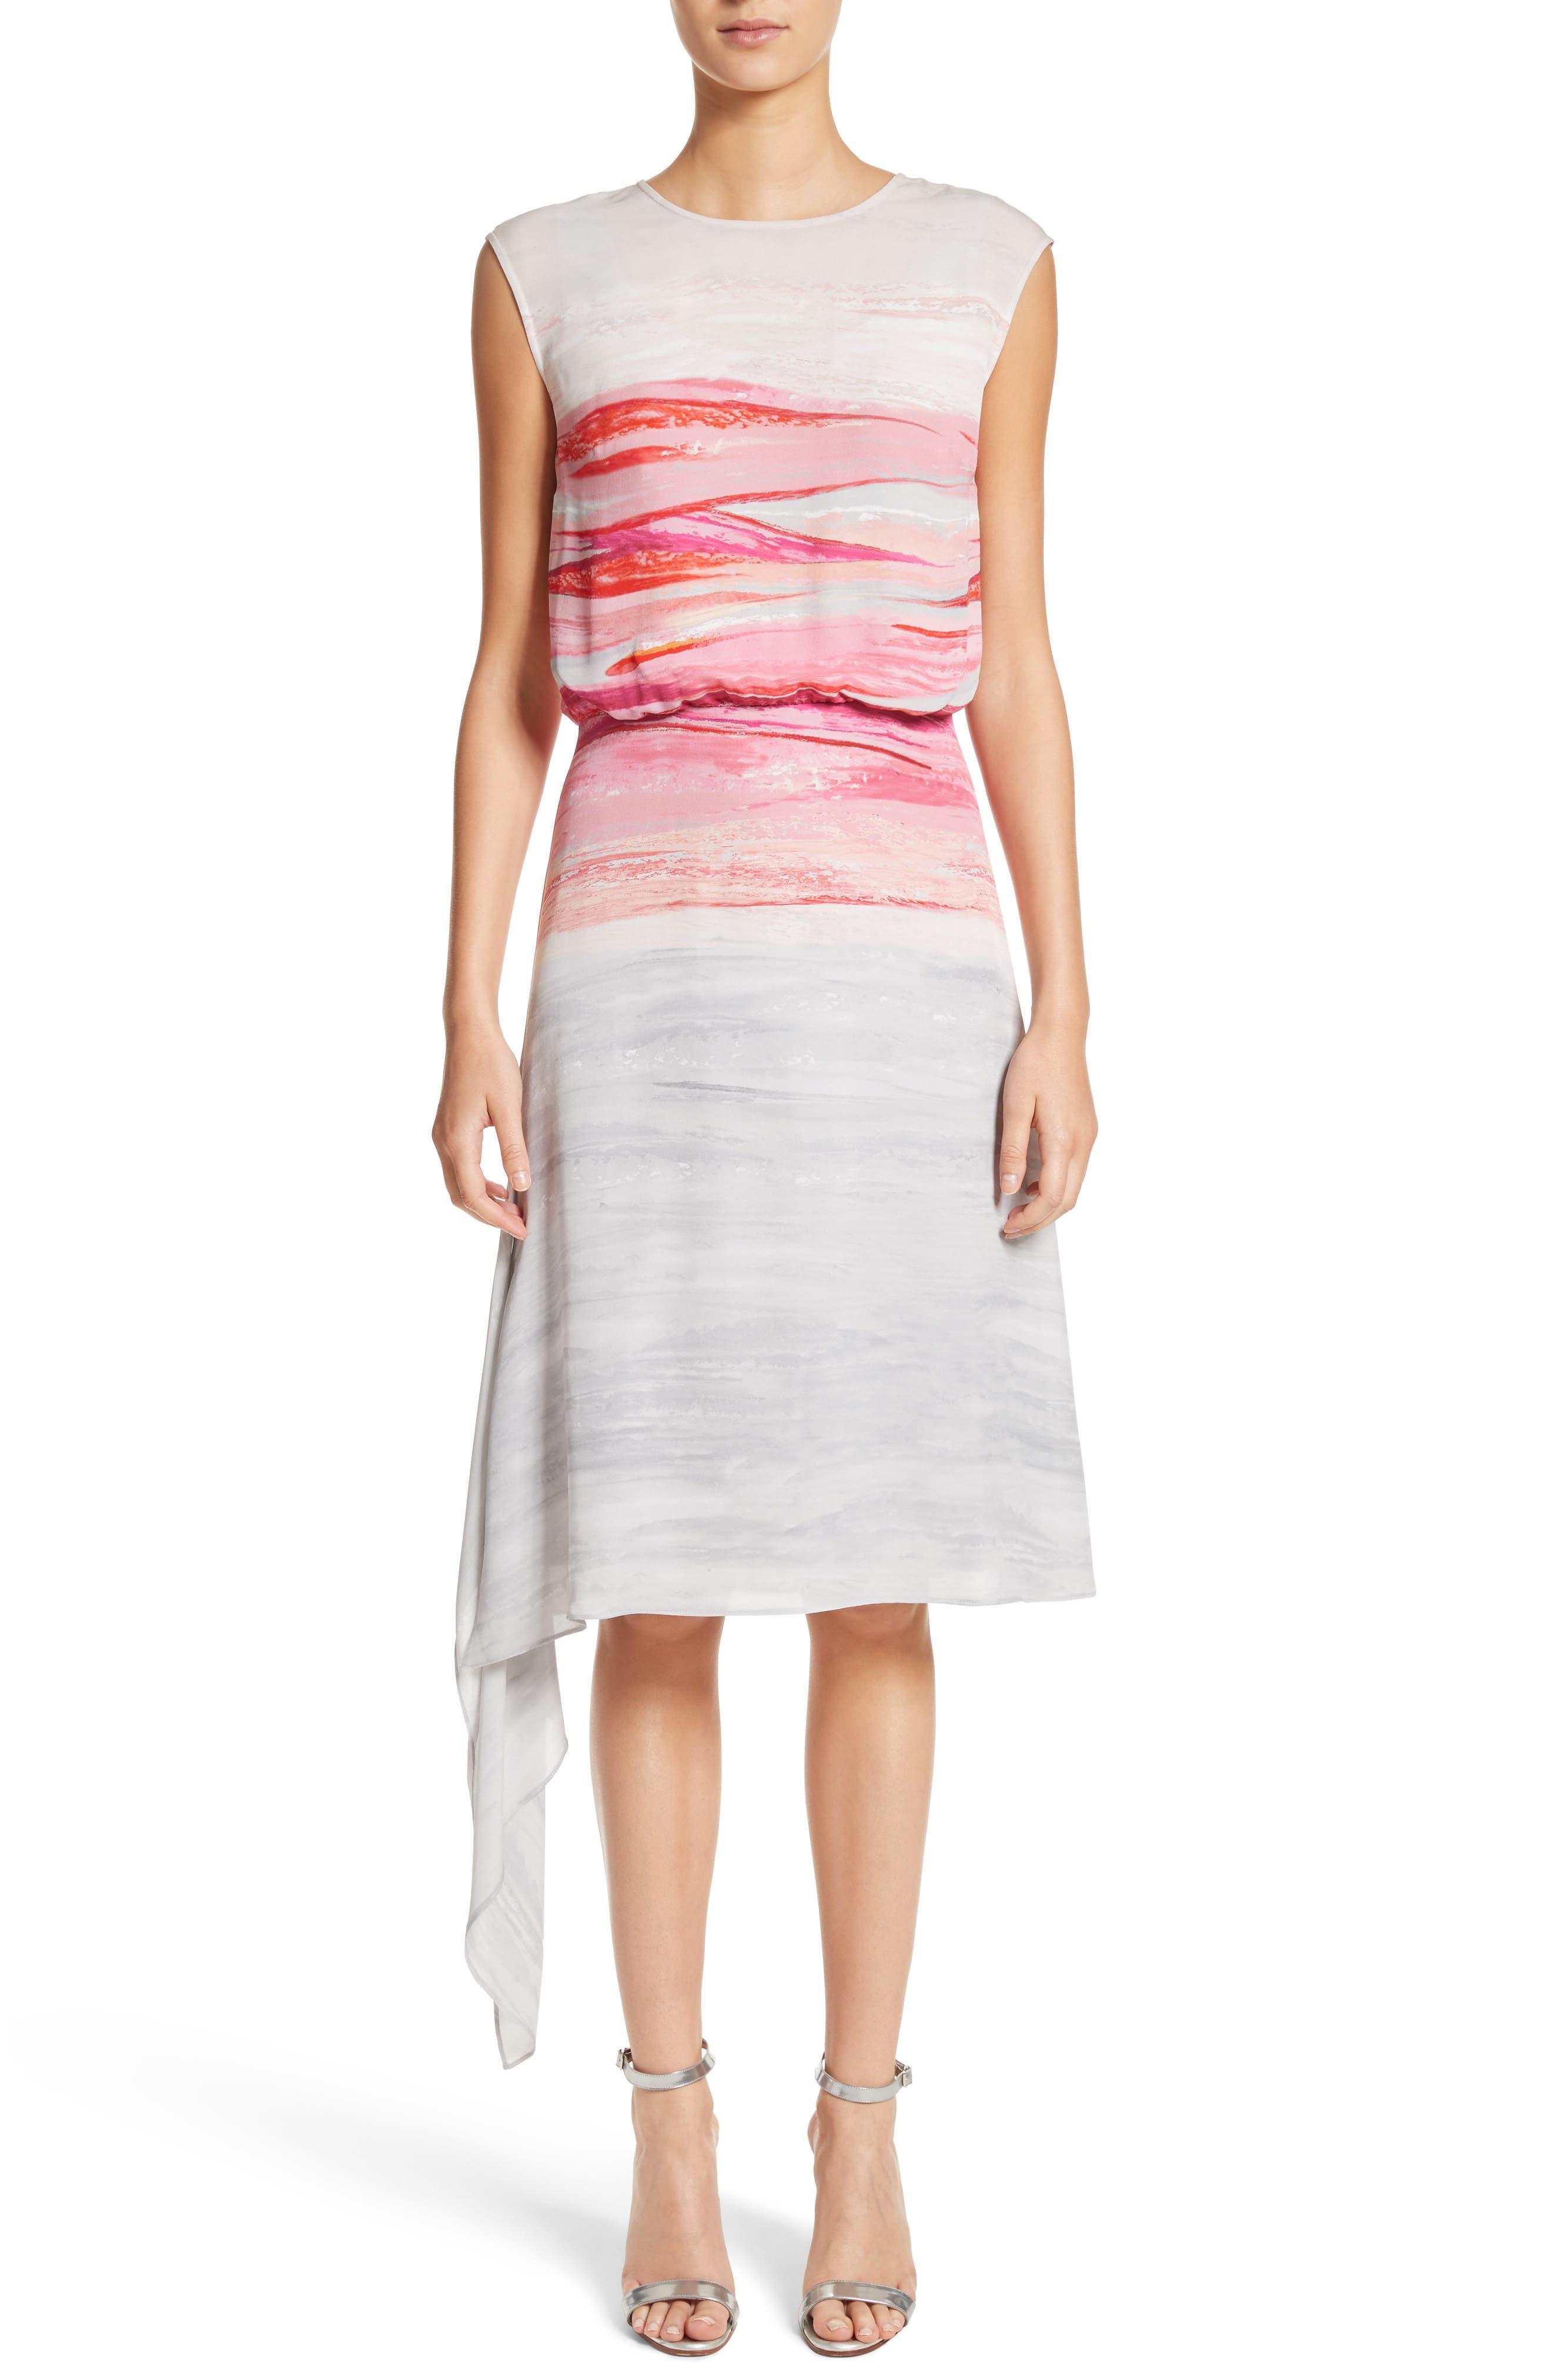 Alternate Image 1 Selected - St. John Collection Textured Brushstroke Print Silk Satin Dress